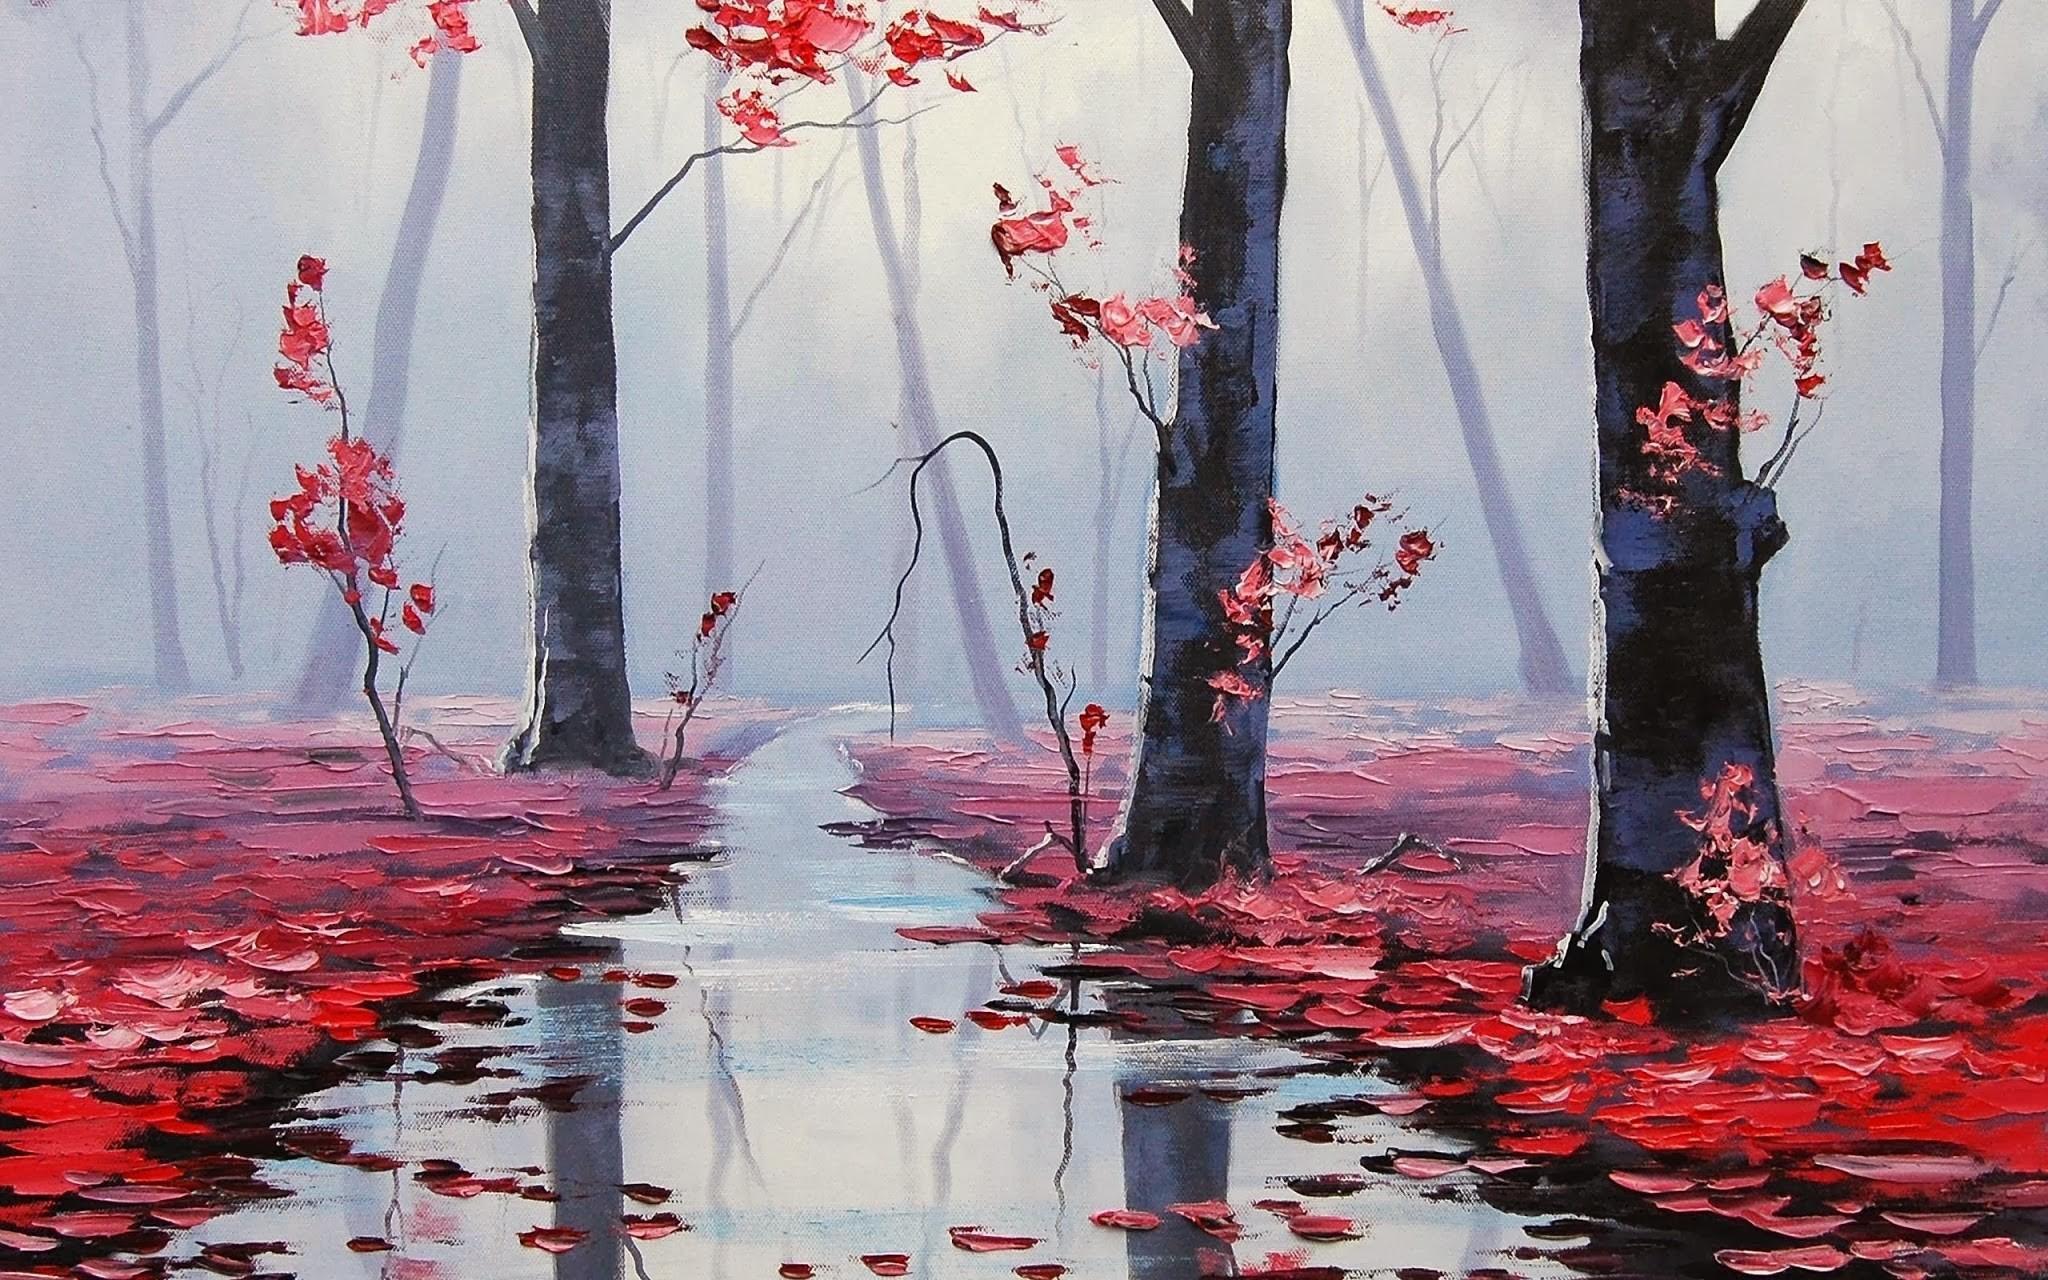 Fondos de pantalla : Árboles, otoño, hojas, naturaleza, rojo ...